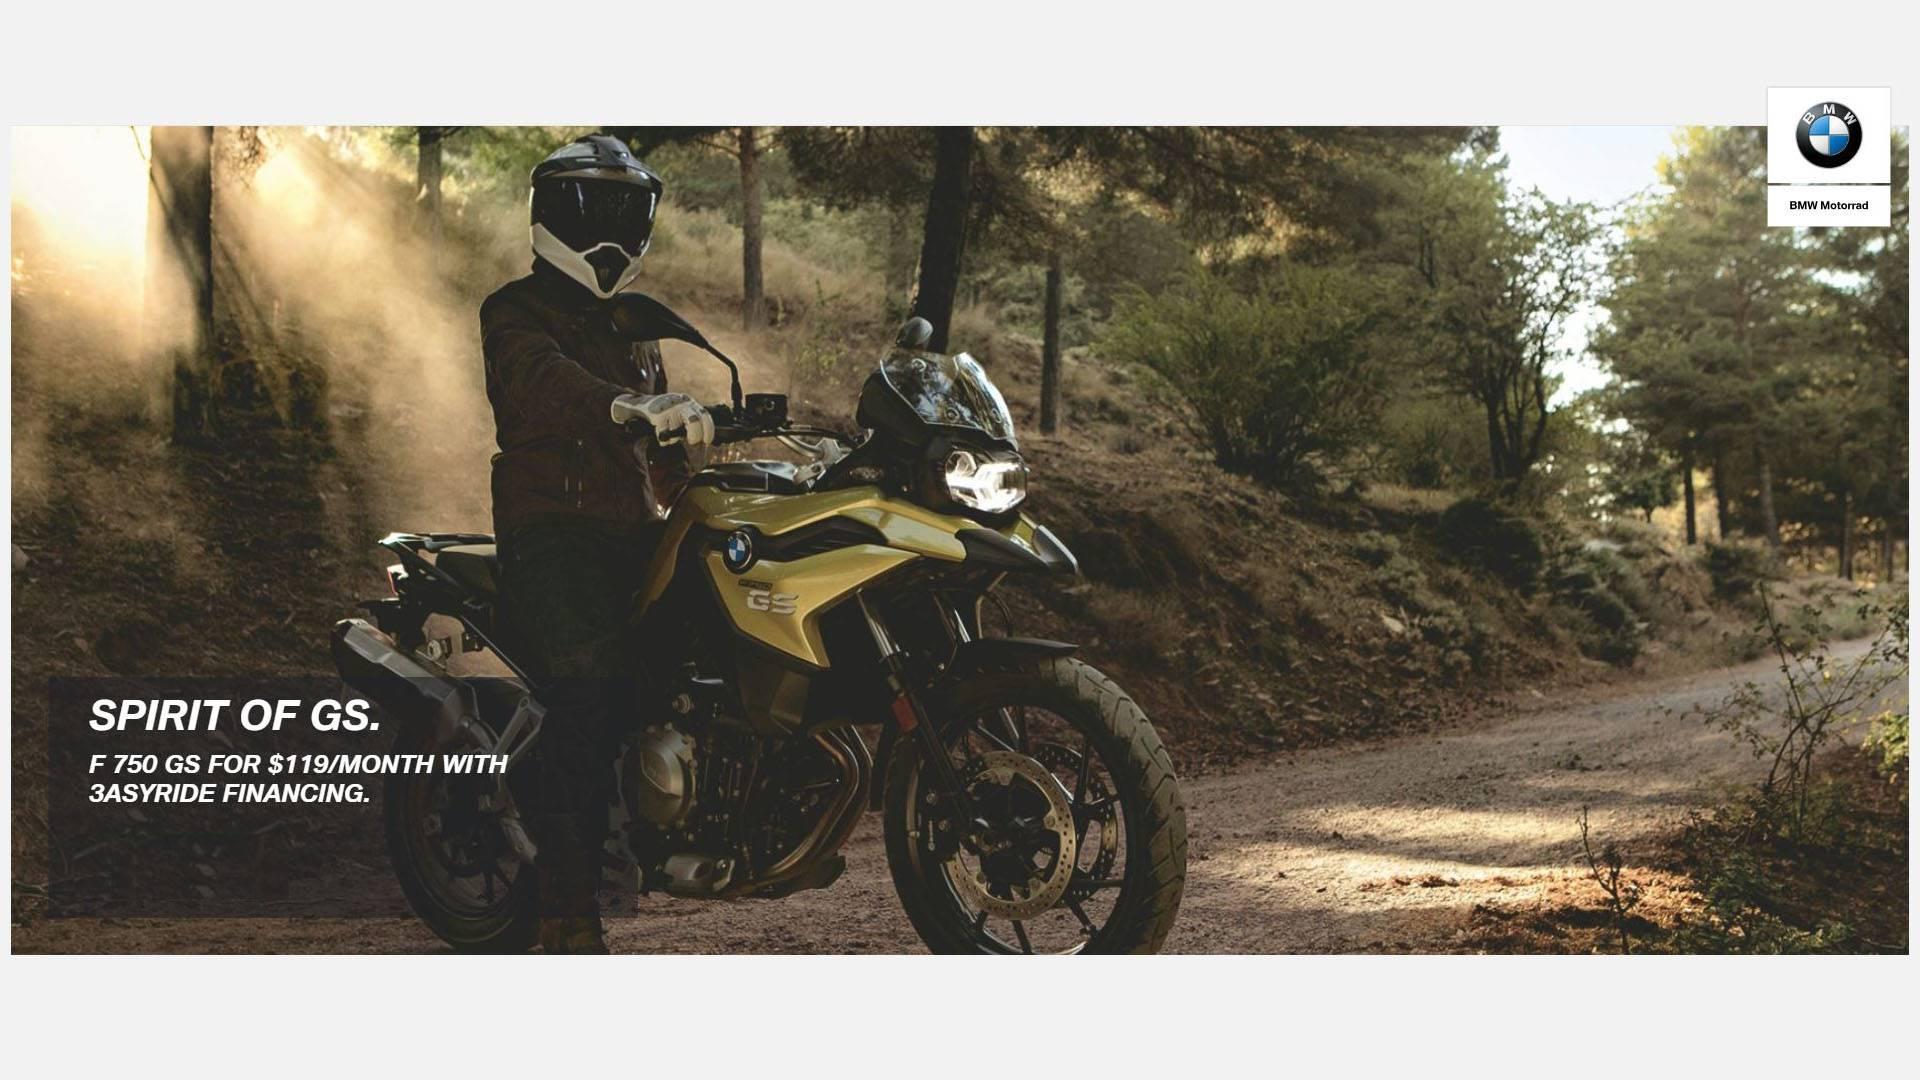 BMW - 3asyRide Adventure Offer